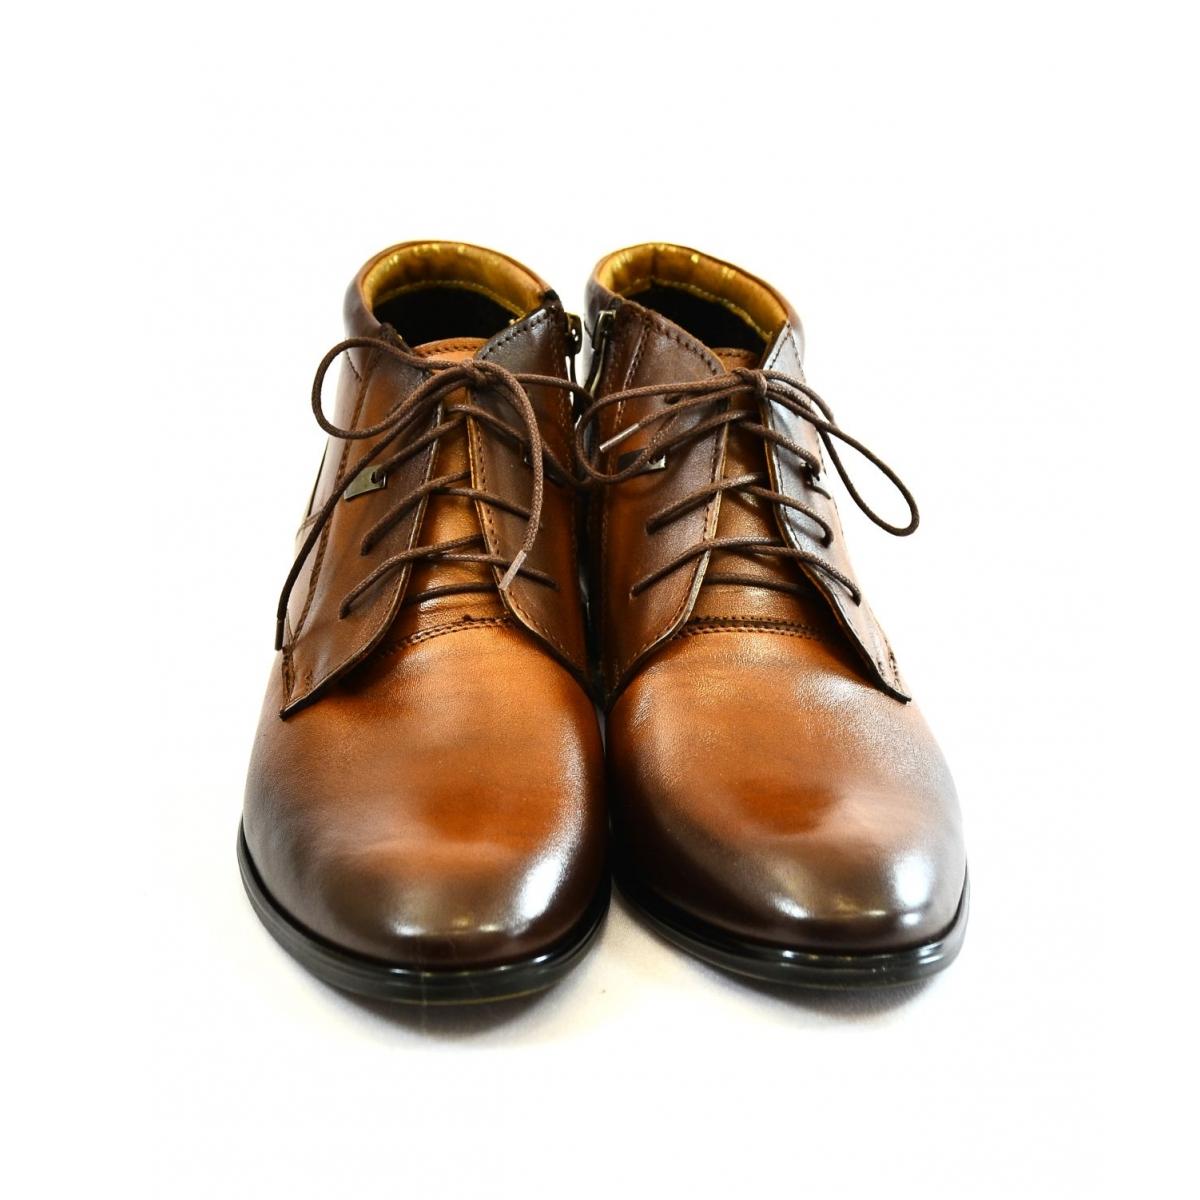 Pánske hnedé kožené zimné topánky TYRION - 3 d99e4d5b730